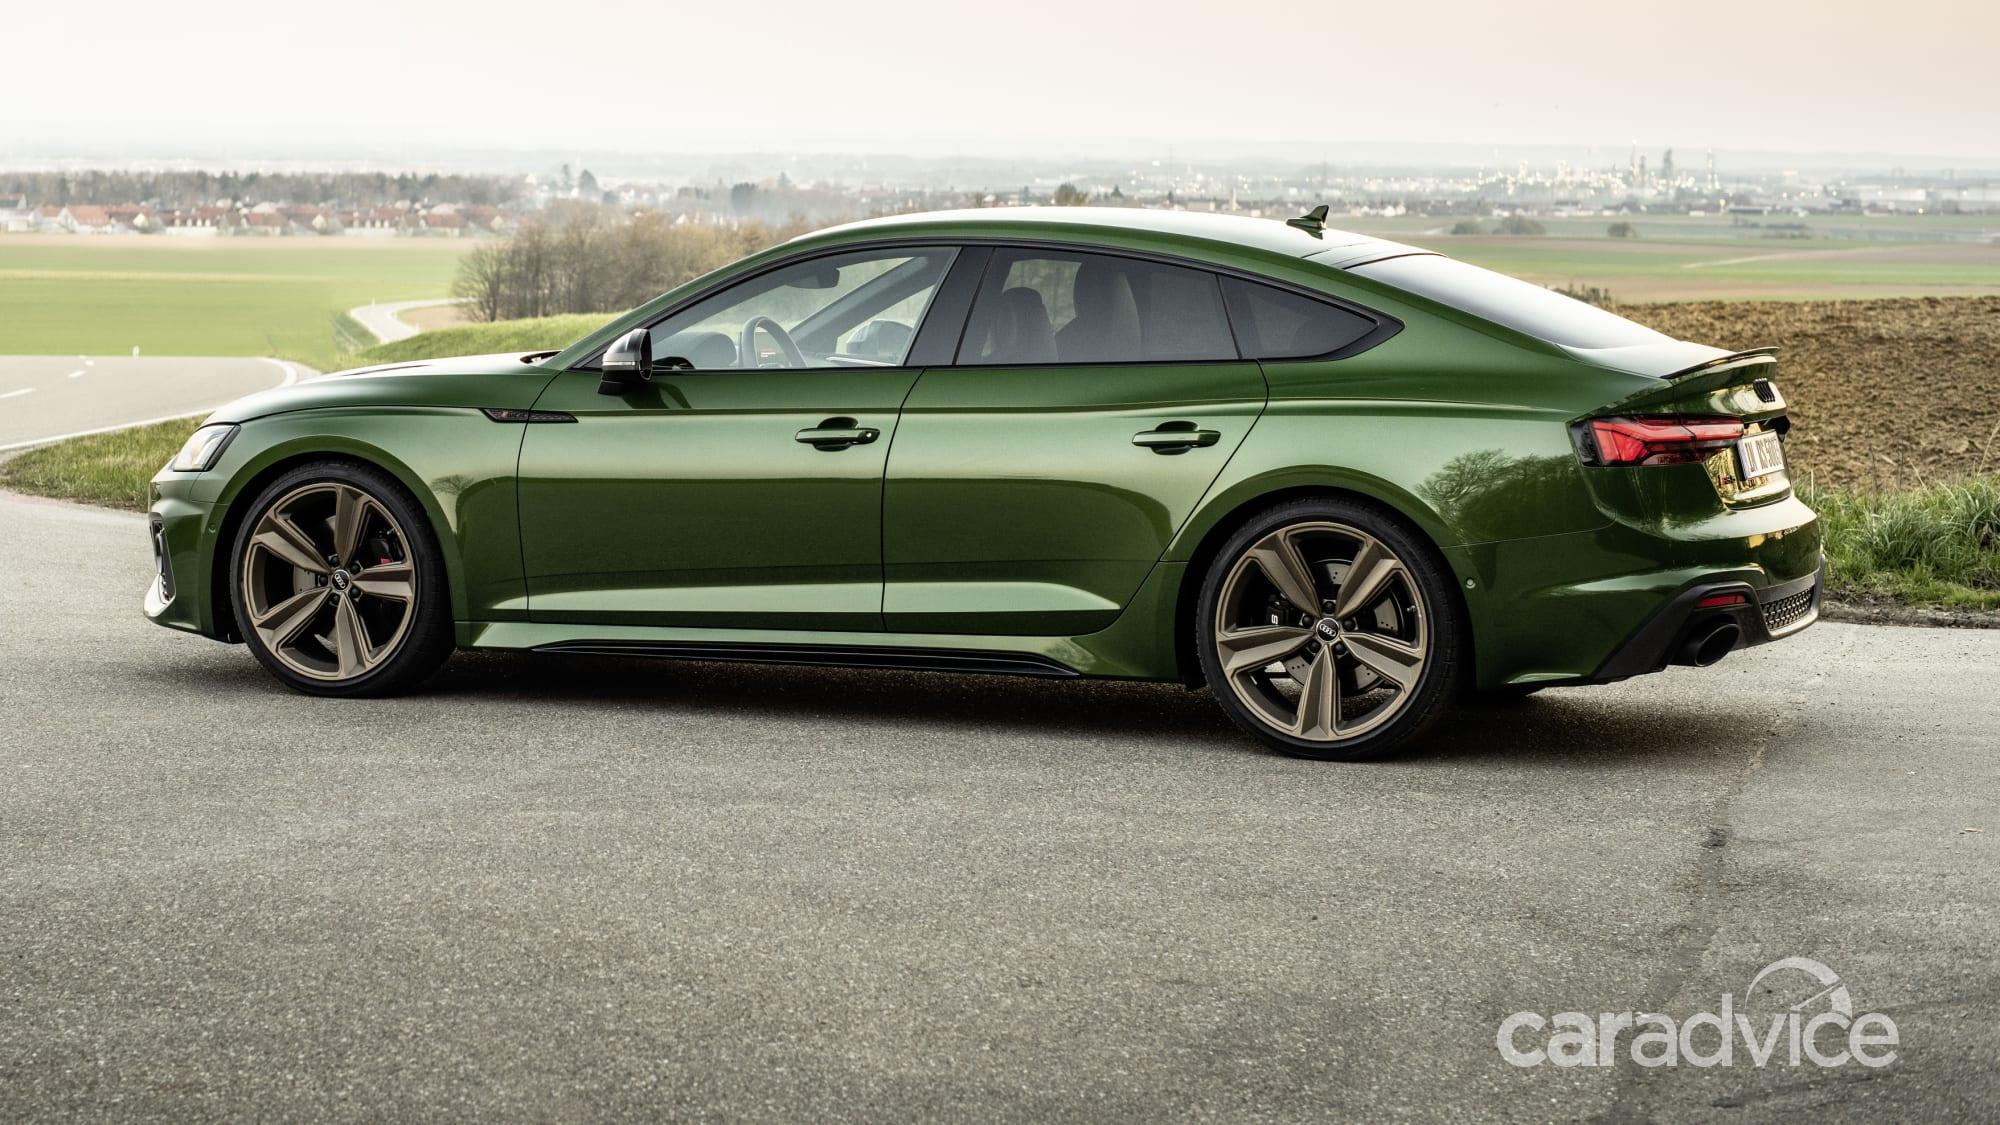 2022 Audi Rs5 Cabriolet Price